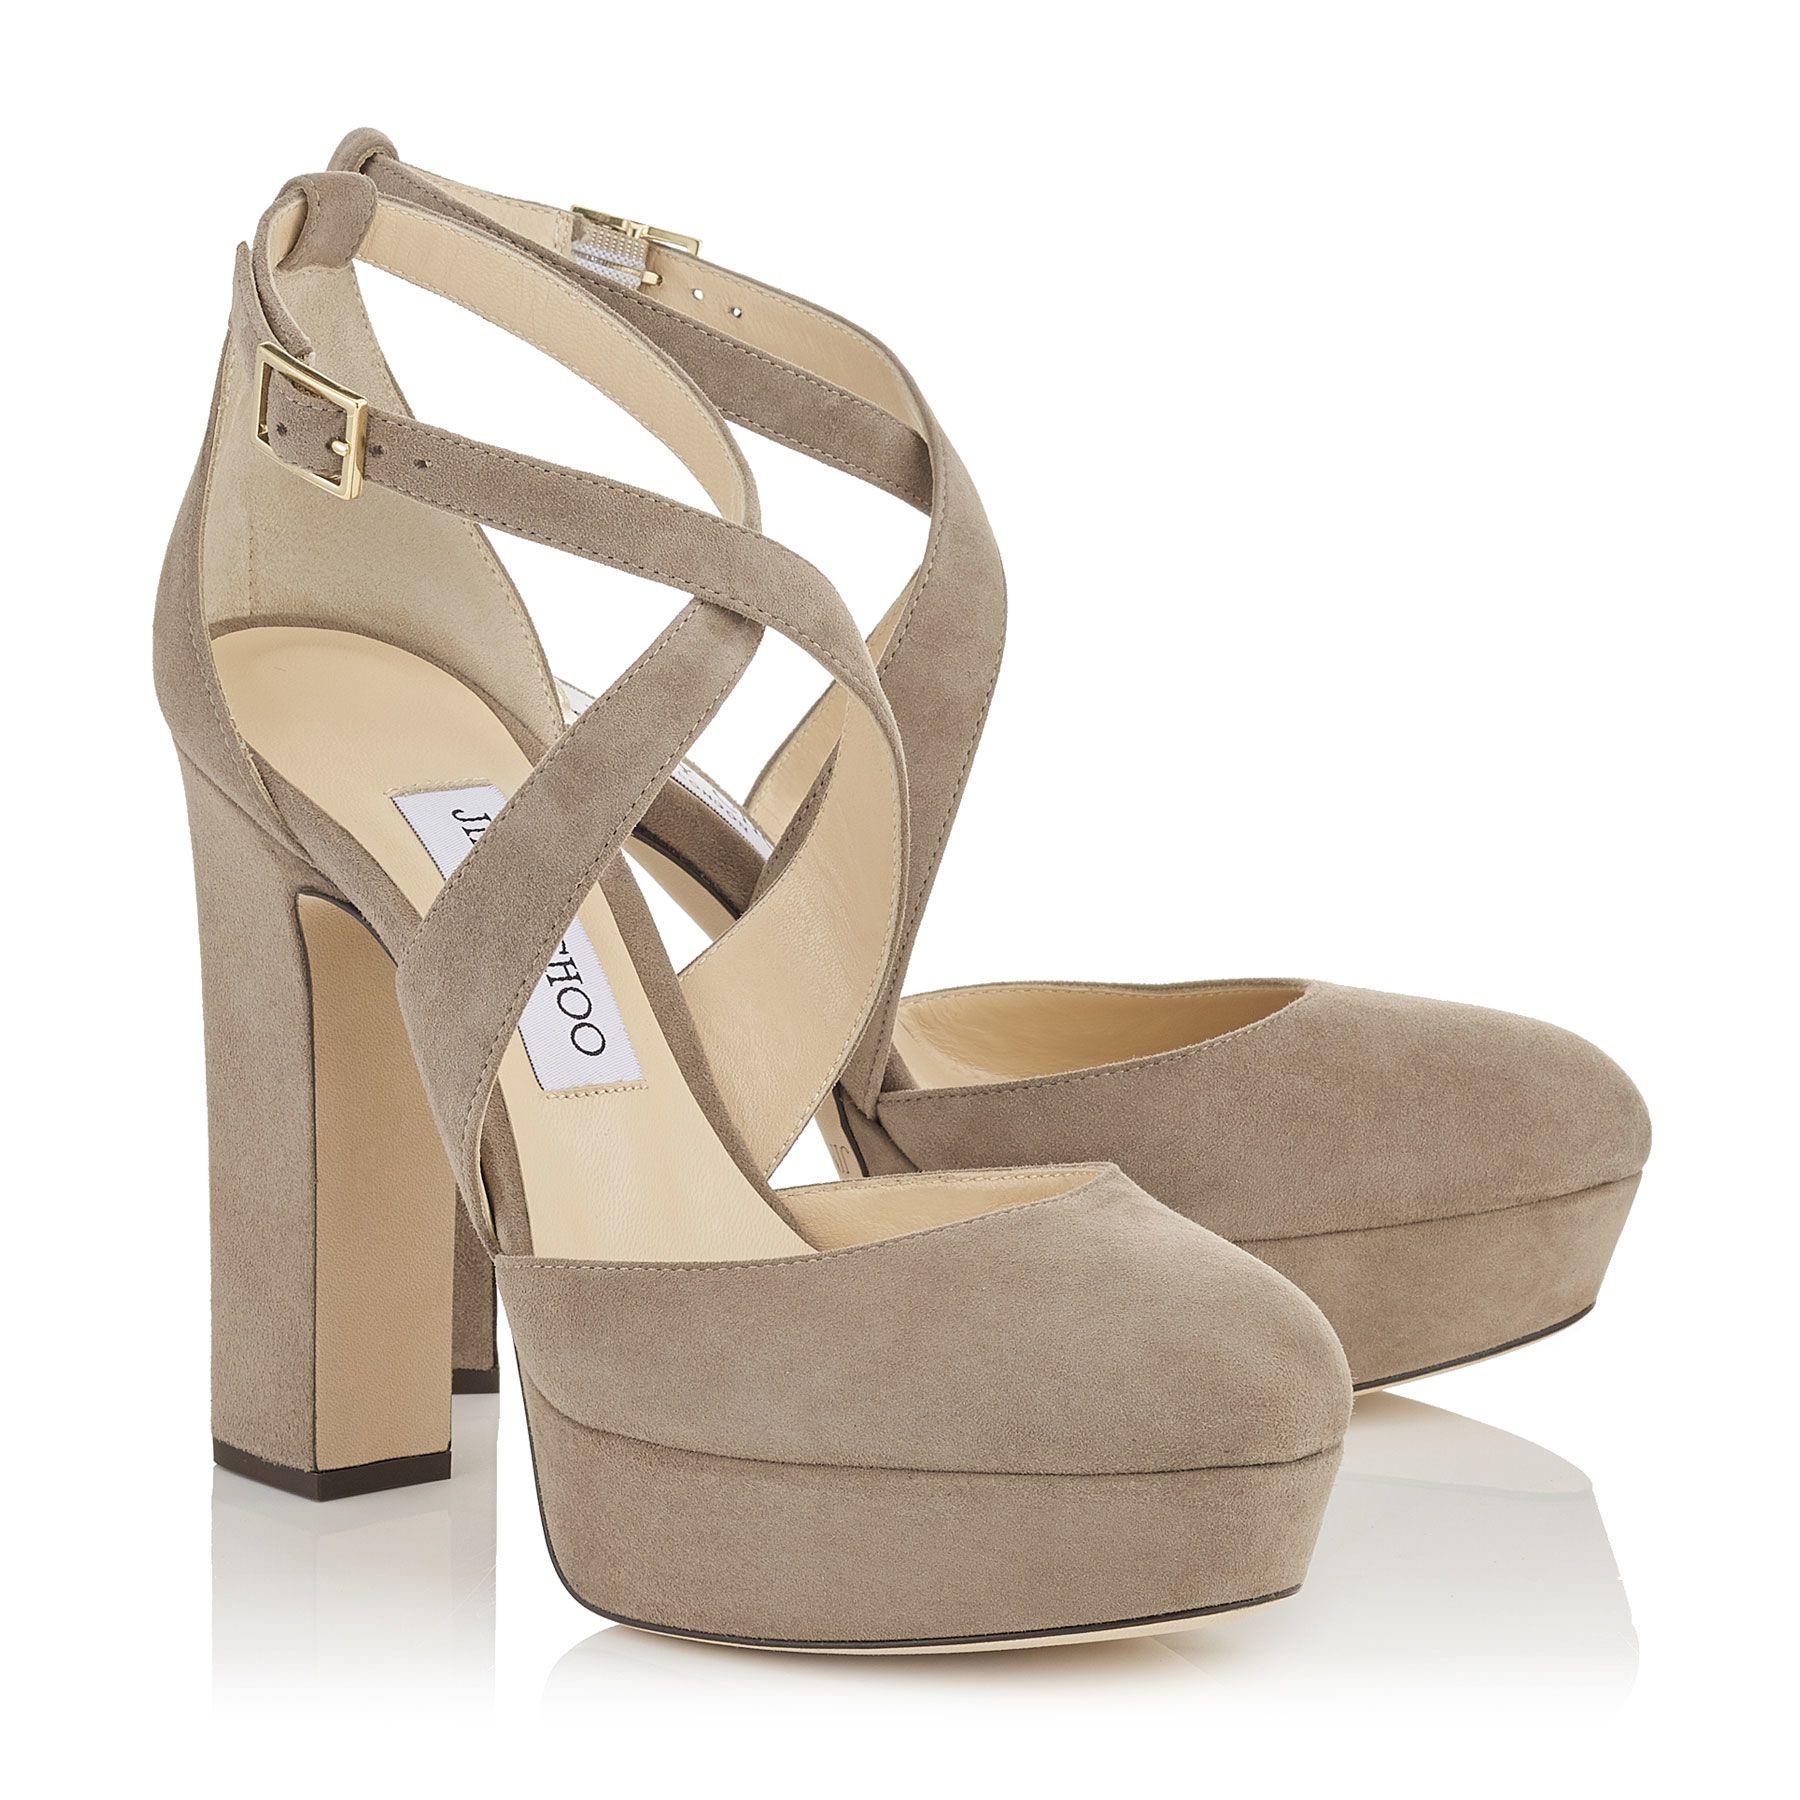 Lowest Prices April Platform Sandal Women Womens Light Mocha Suede Jimmy Choo Womens Designer Shoes